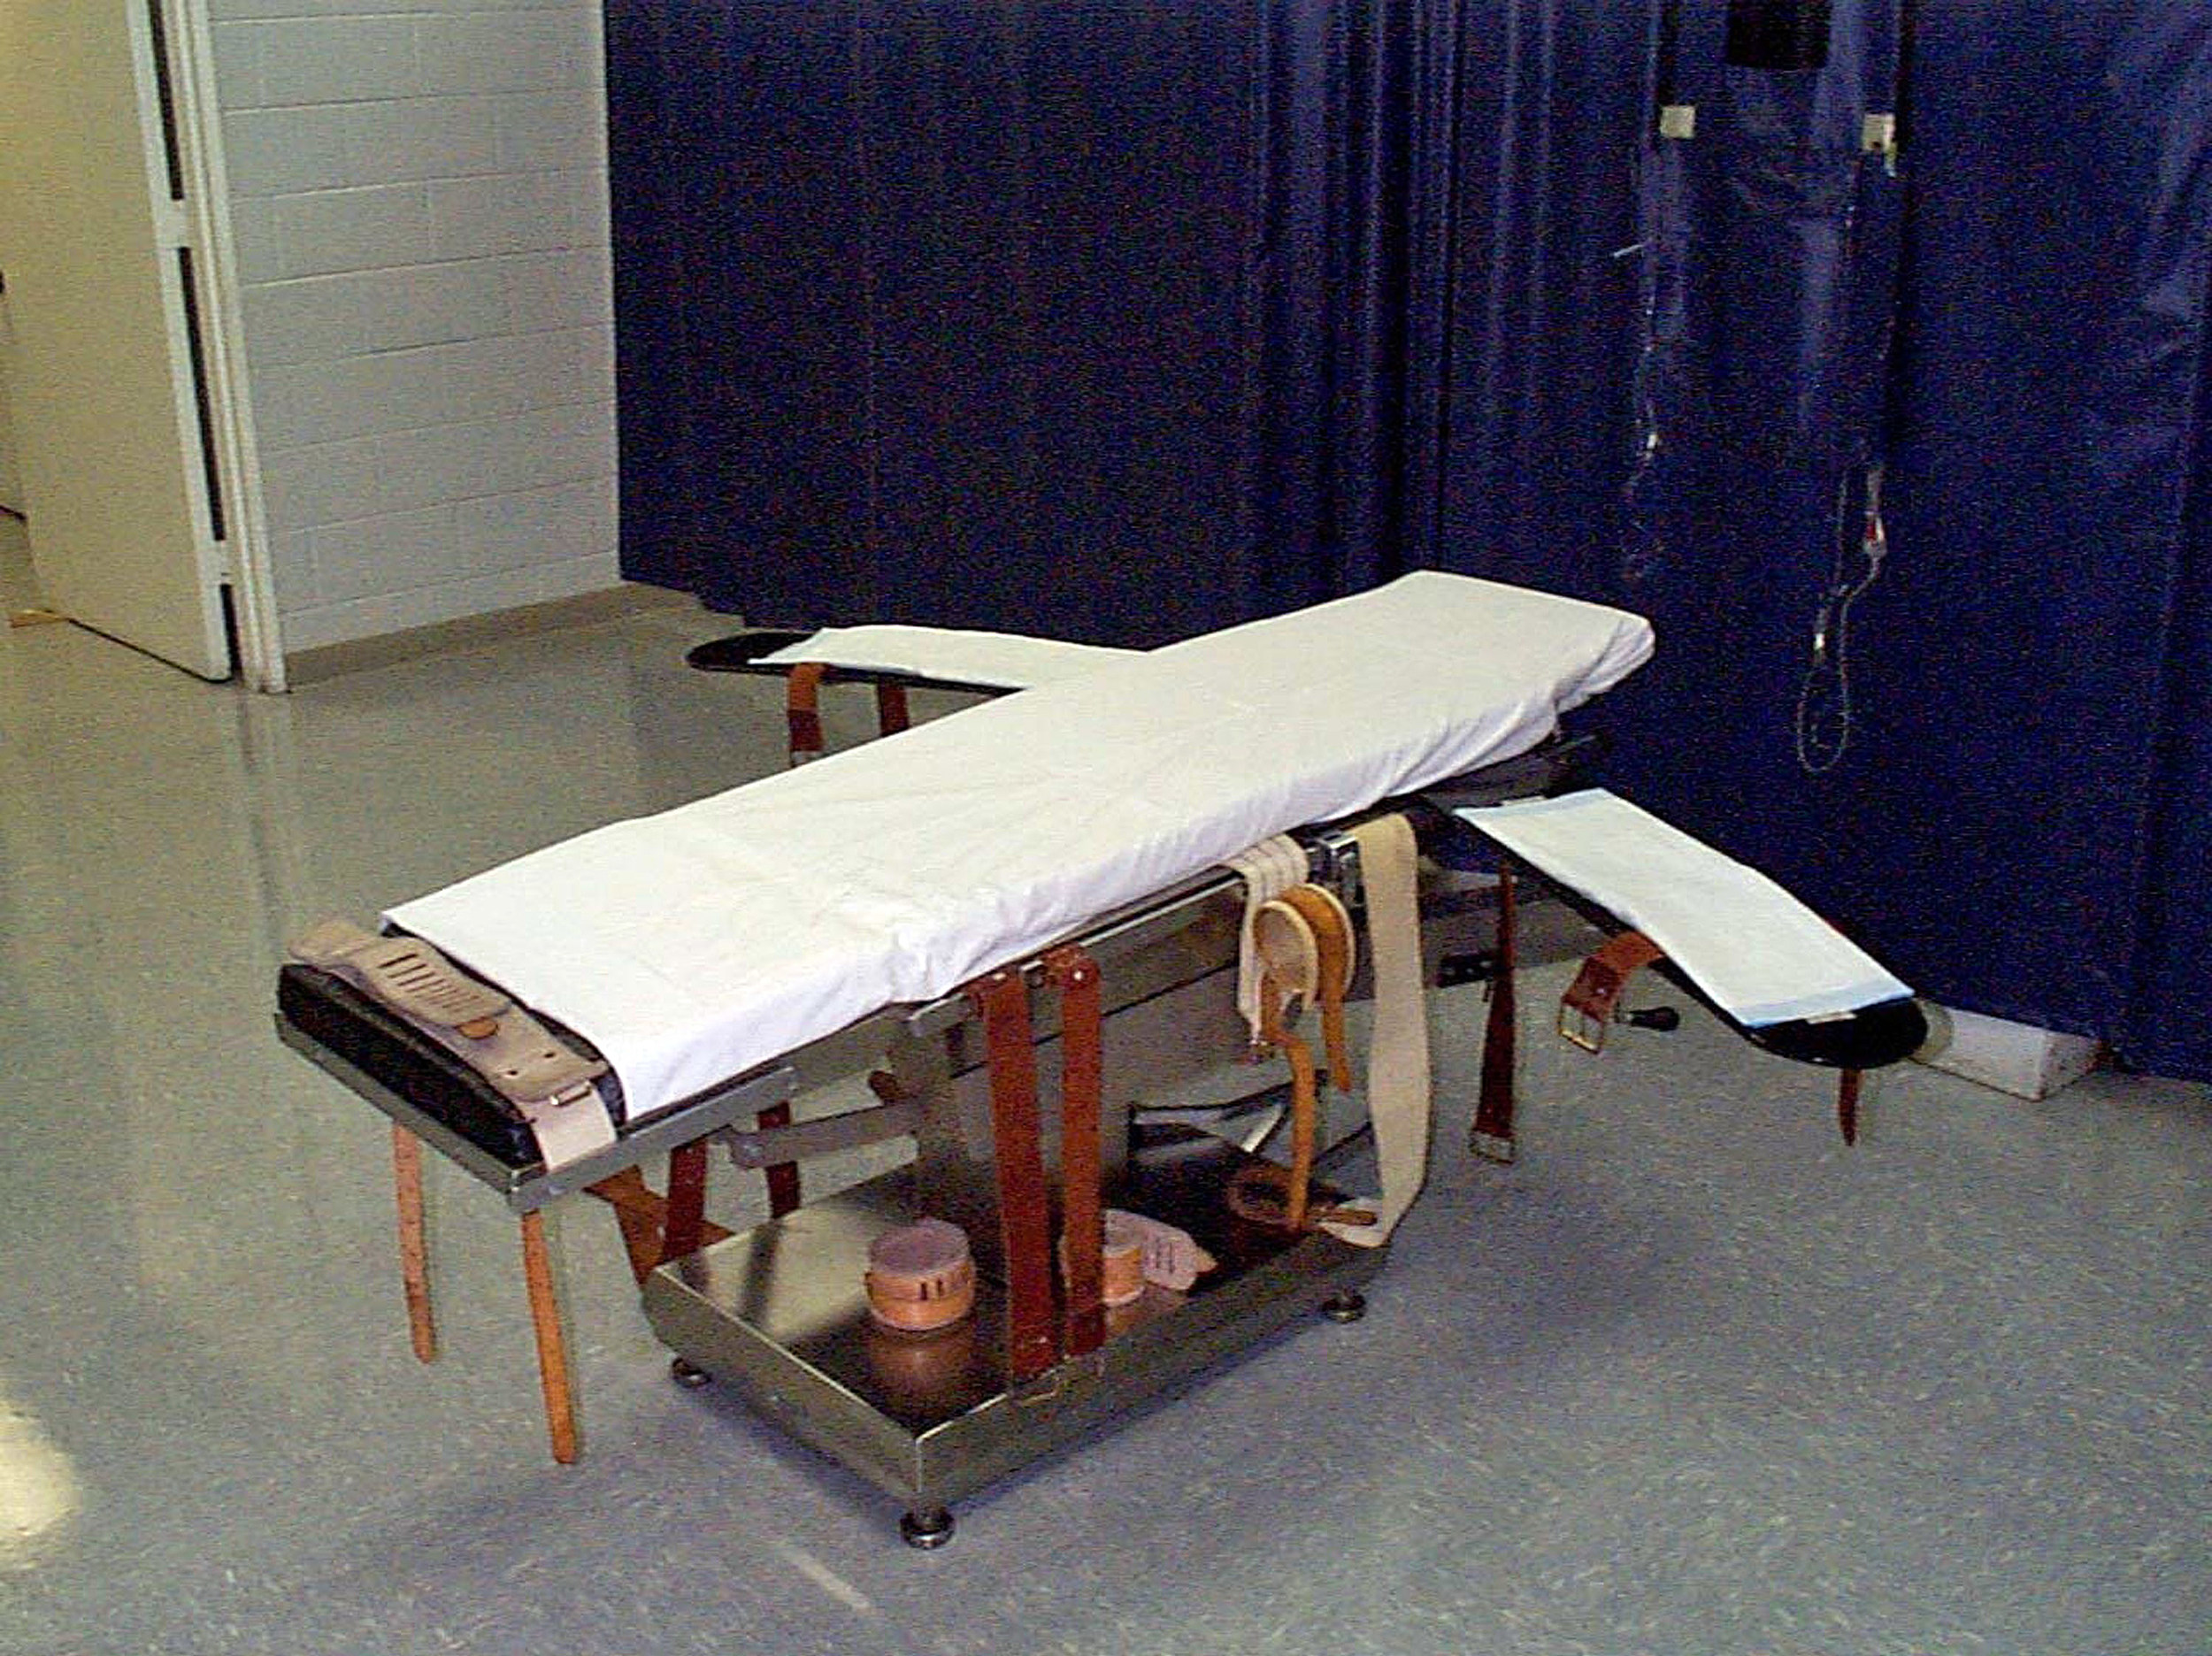 DC Sniper John Allen Muhammad Executed In Virginia